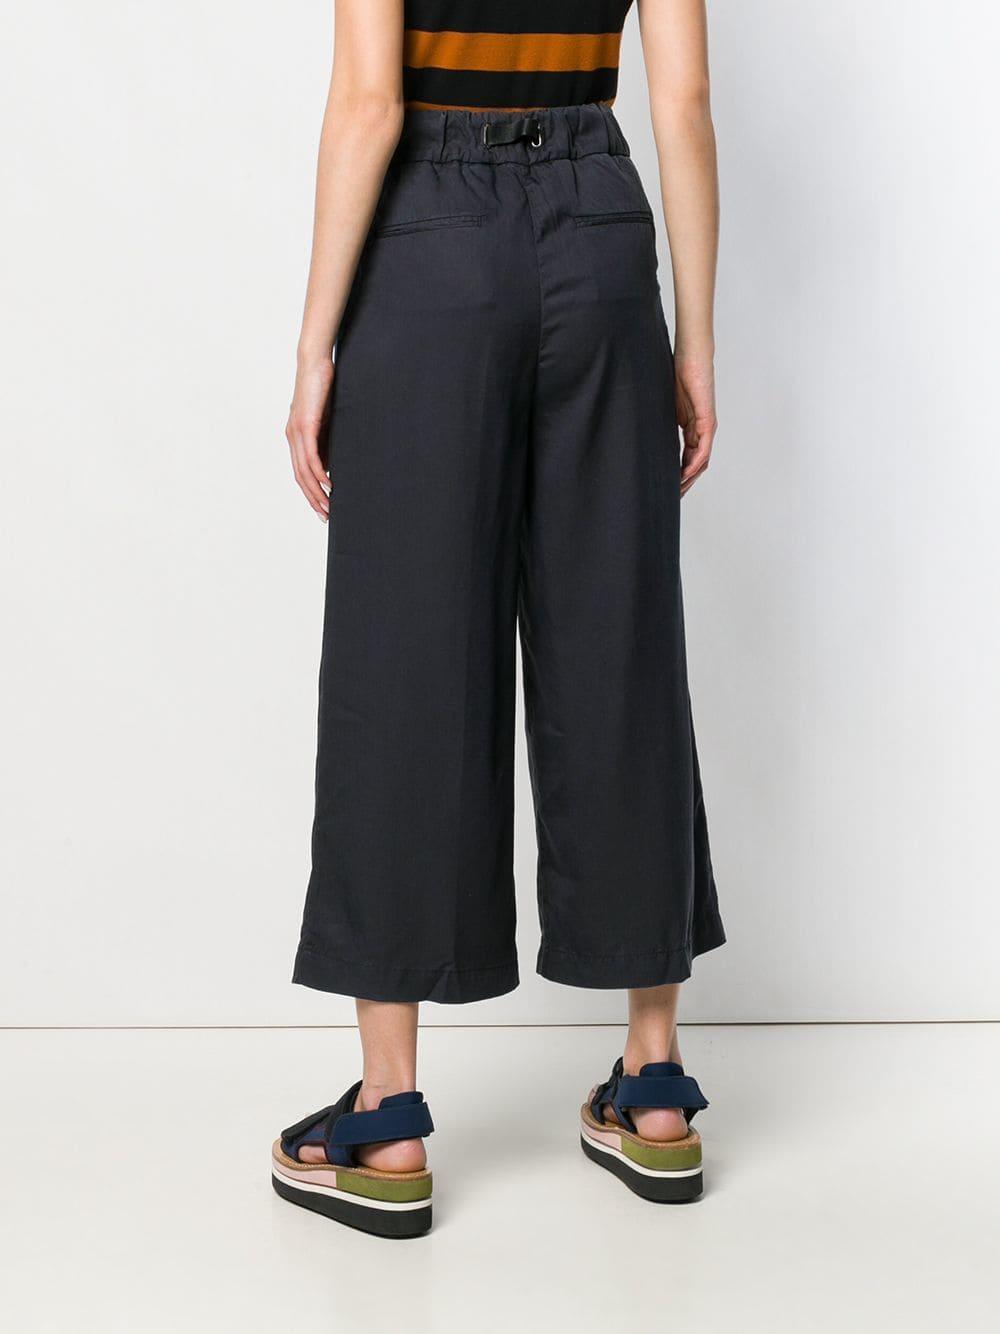 Pantalones capri anchos White Sand de color Azul